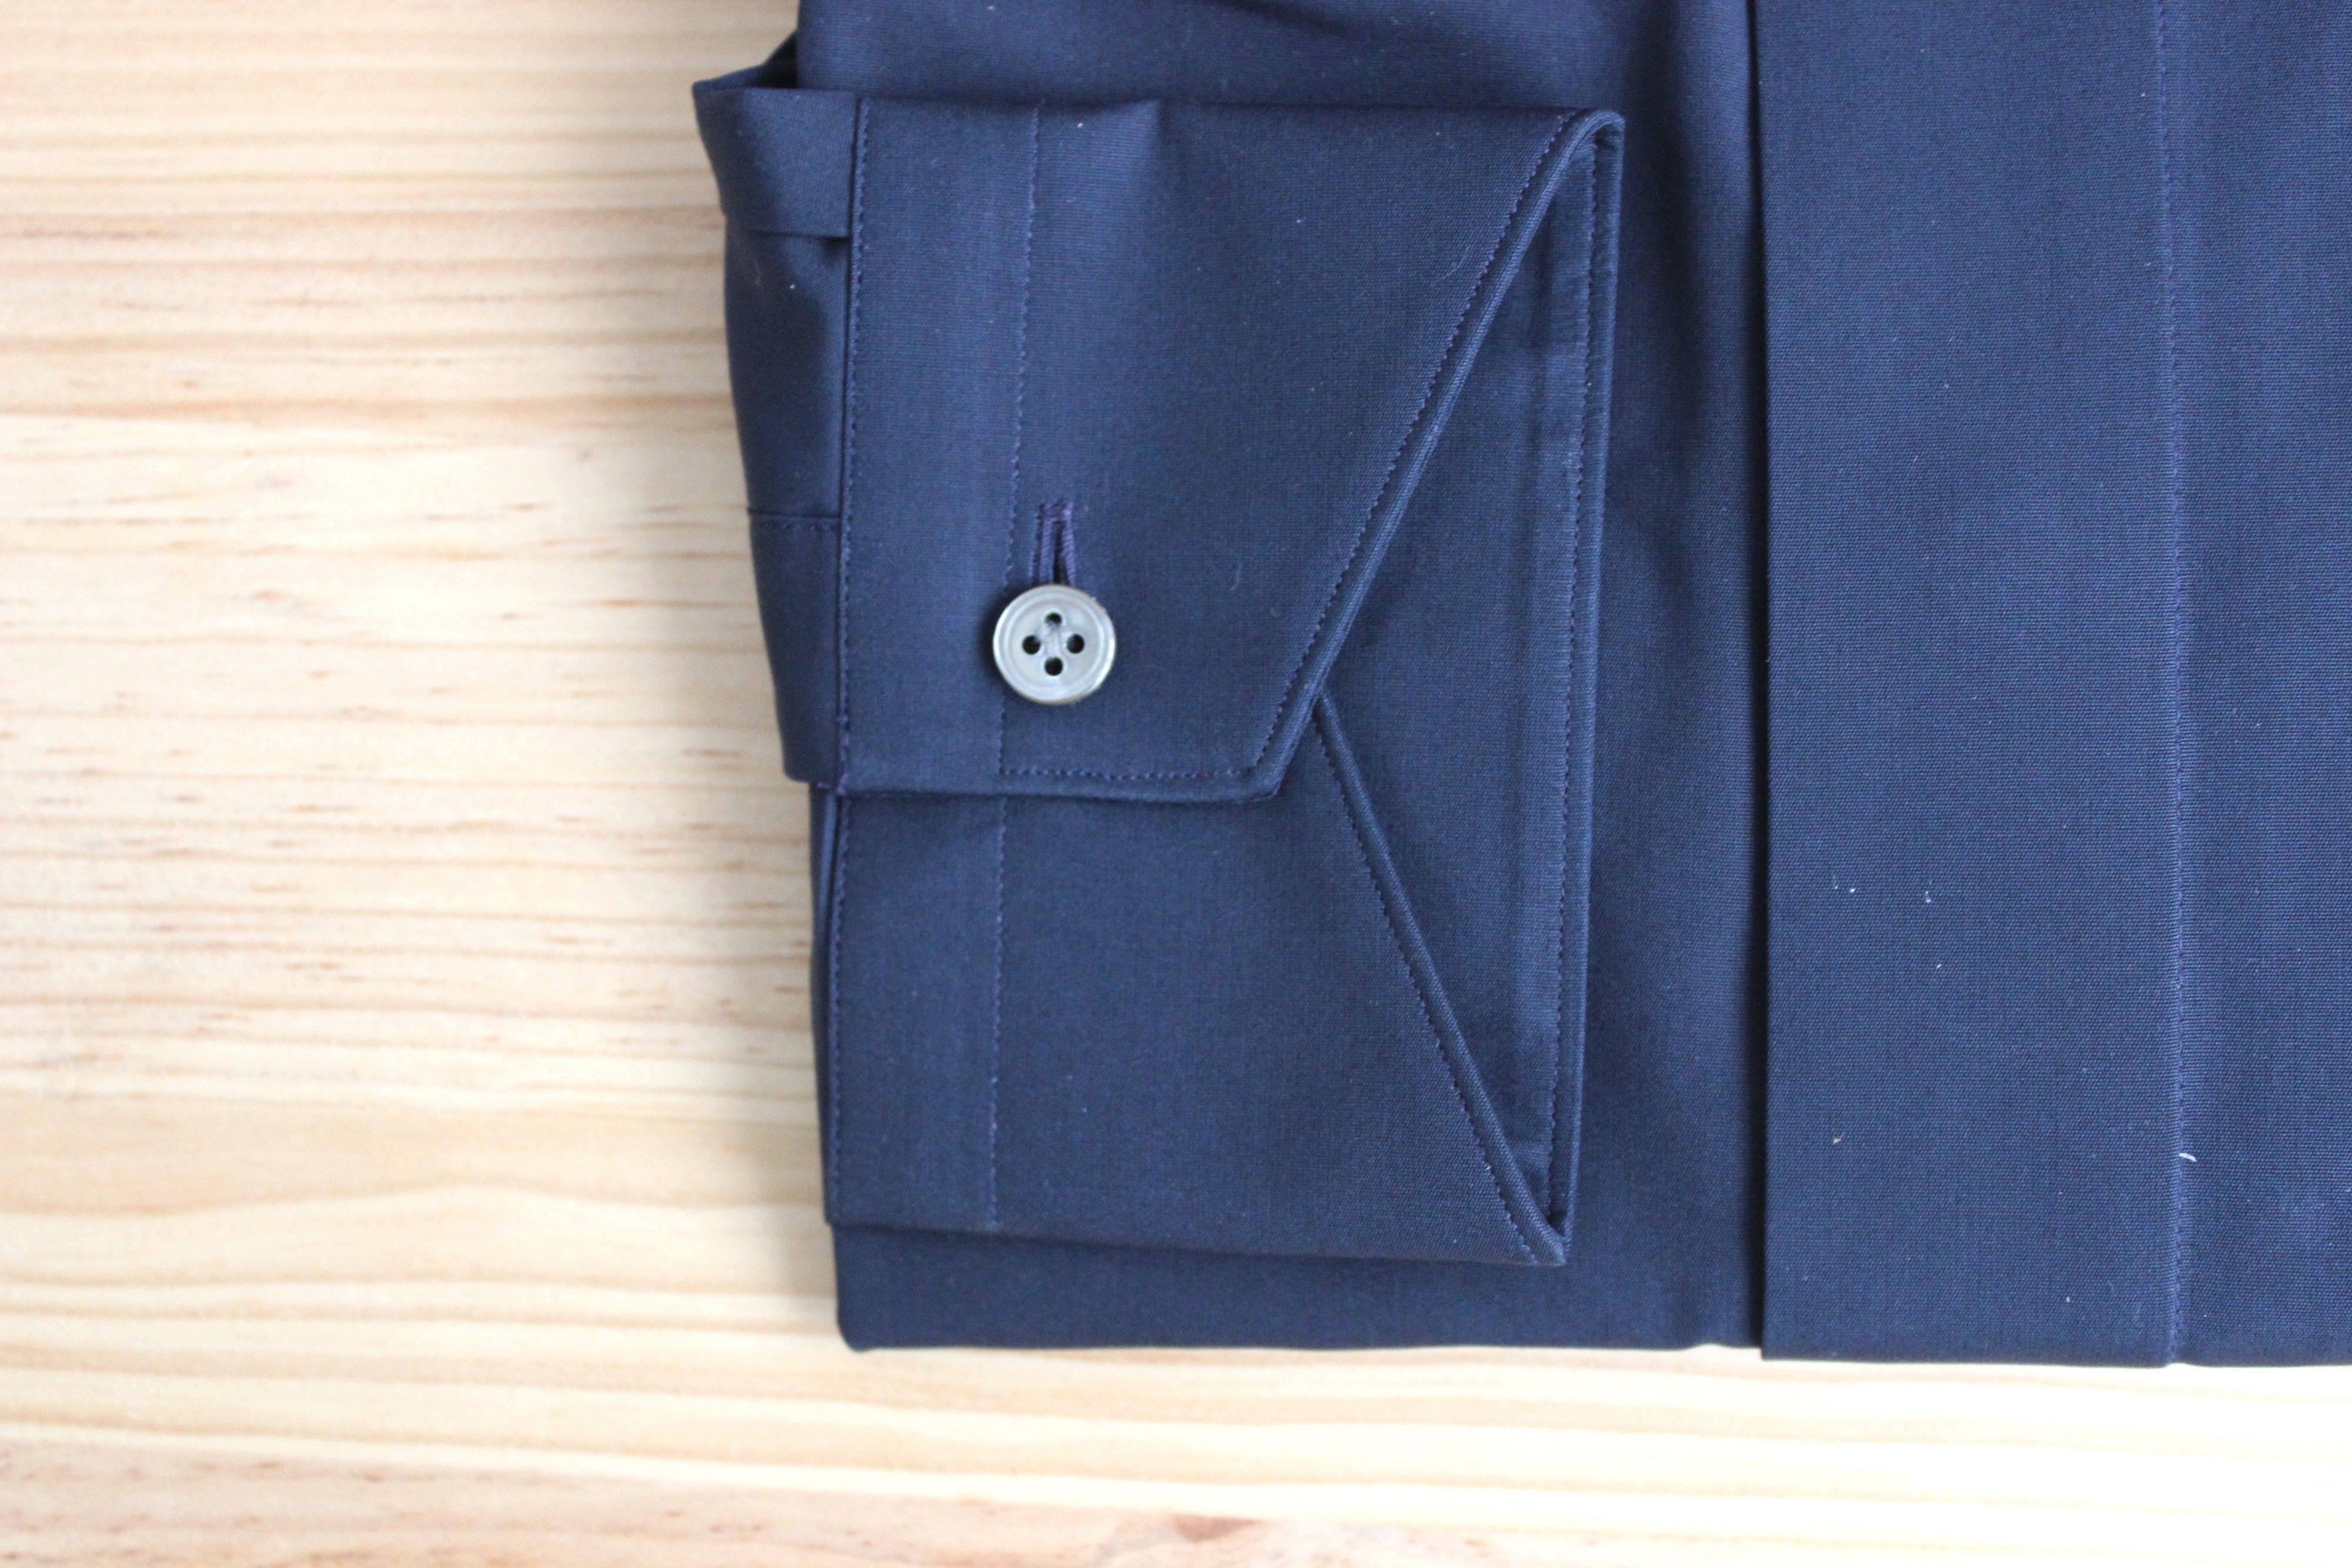 chemise cintrée homme, chemise cintrée , chemise sur mesure